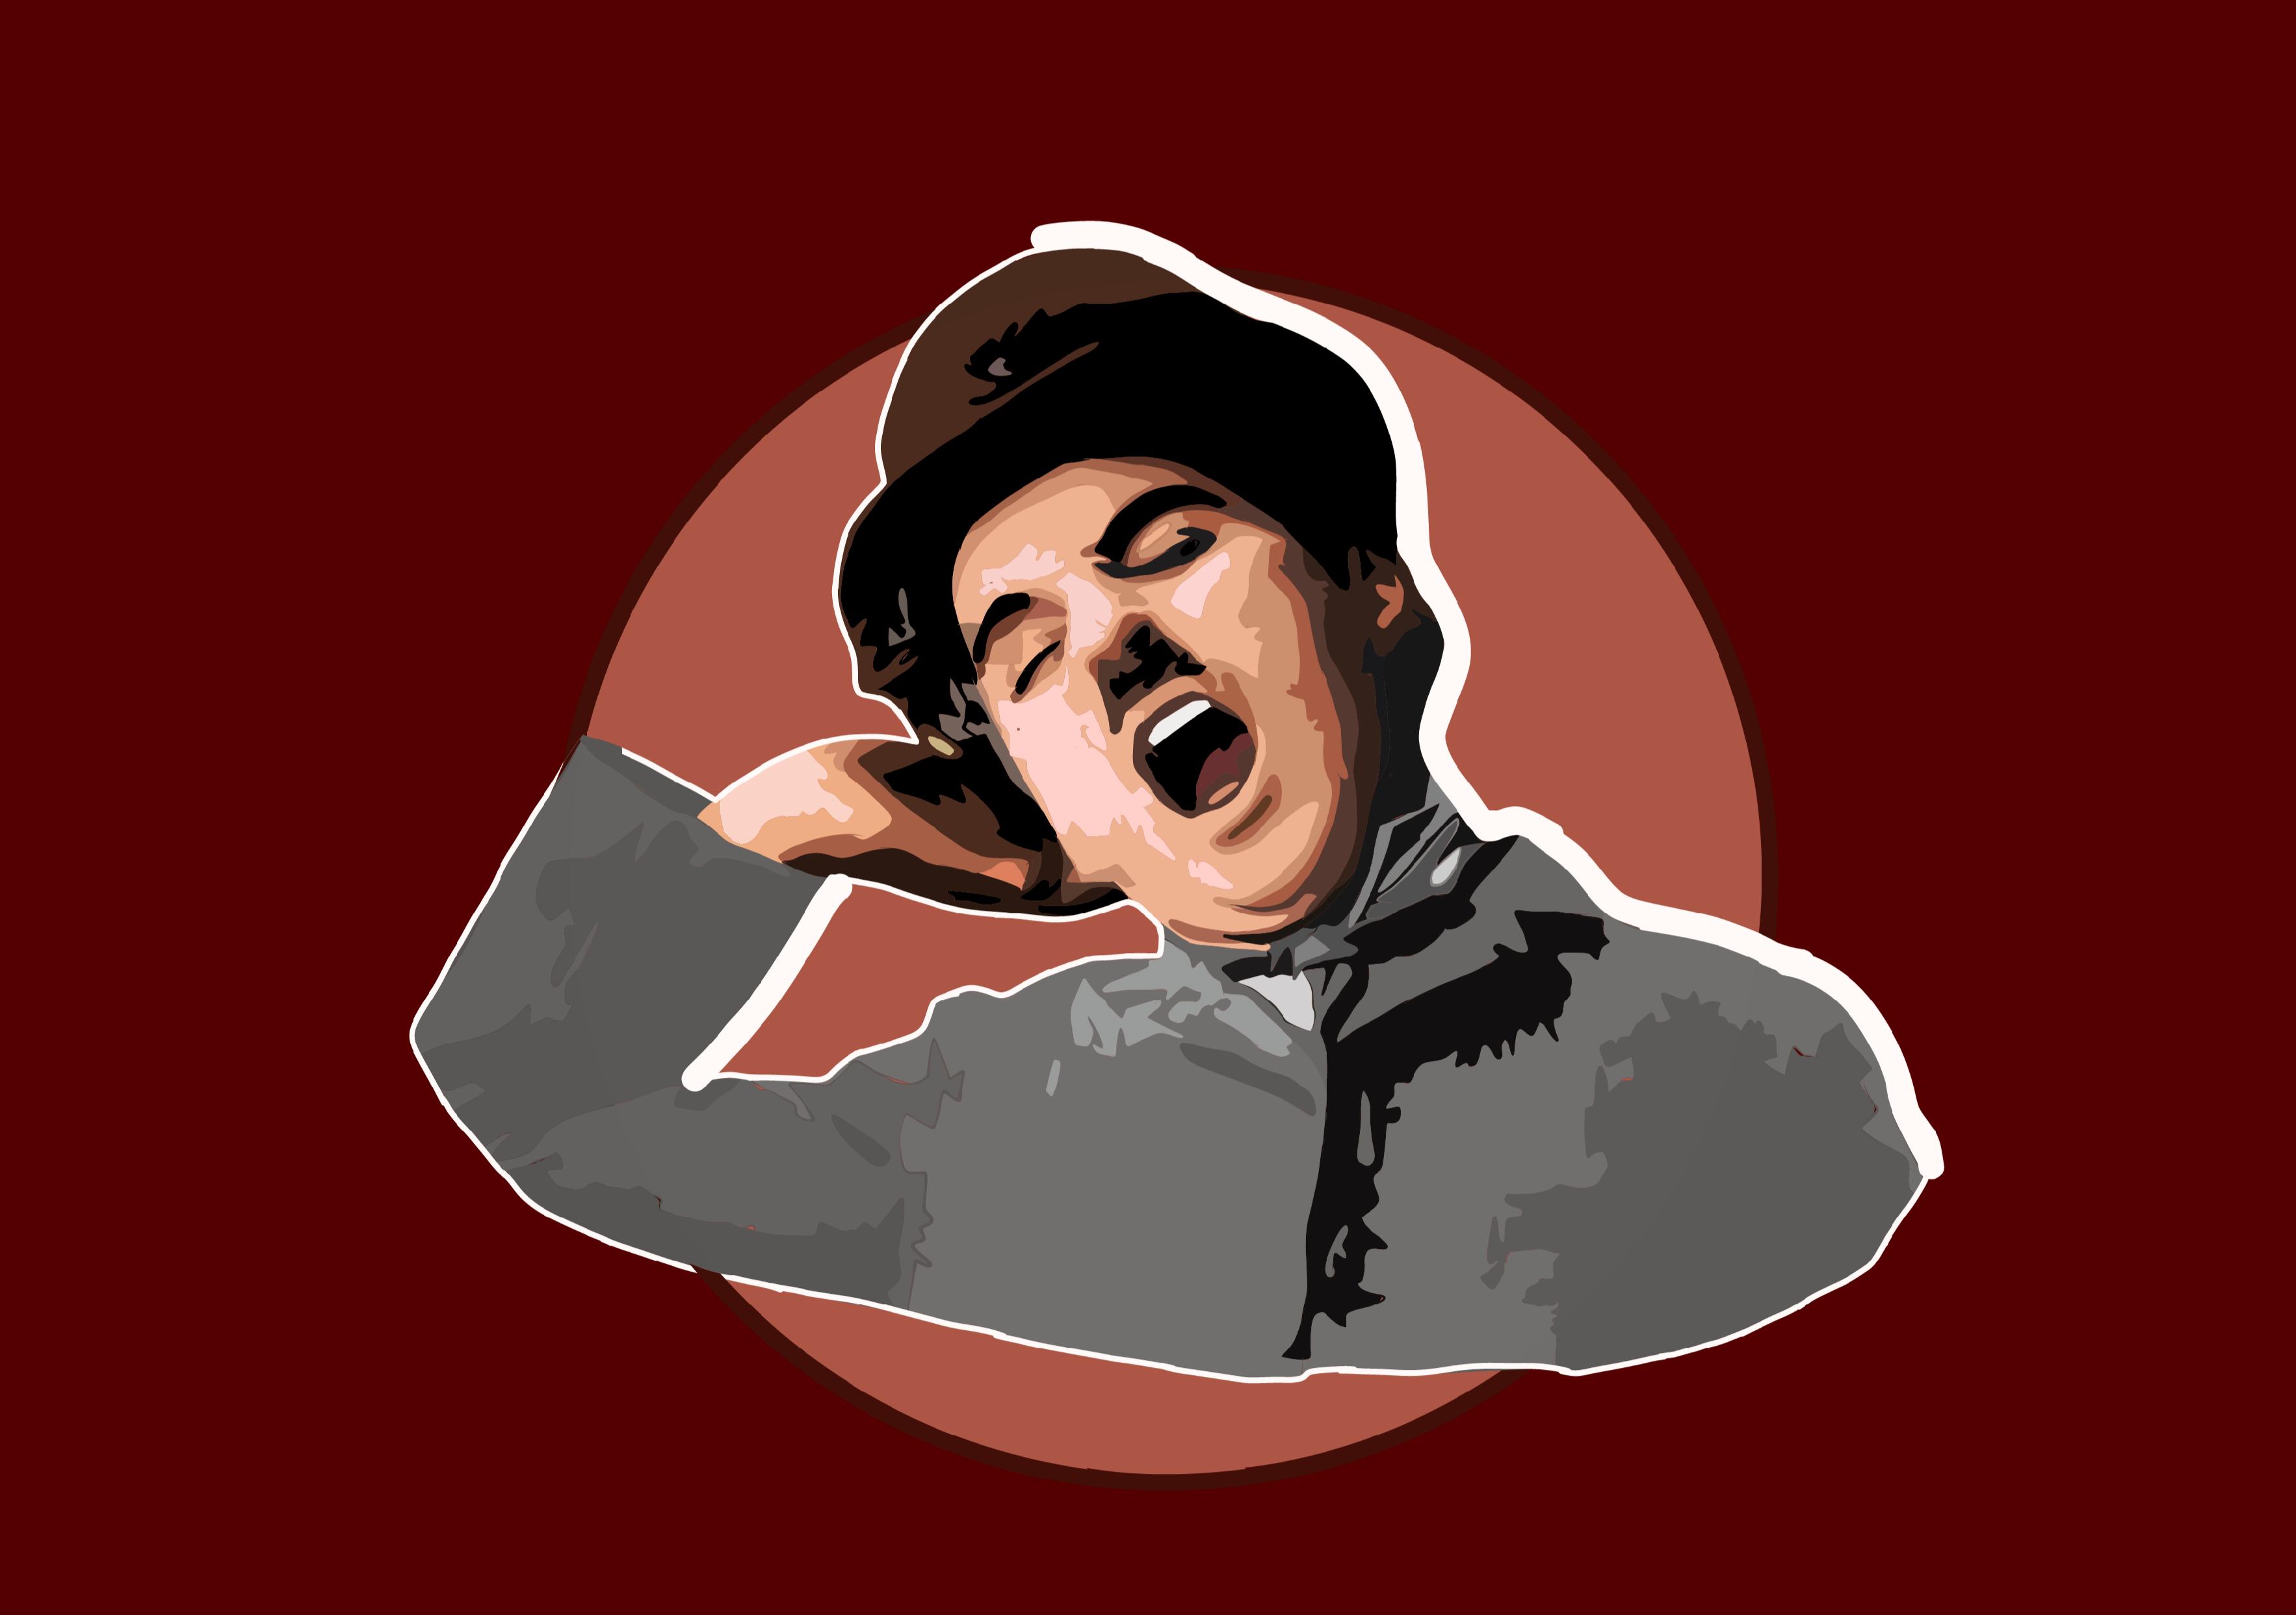 Illustration of Charlie Chaplin